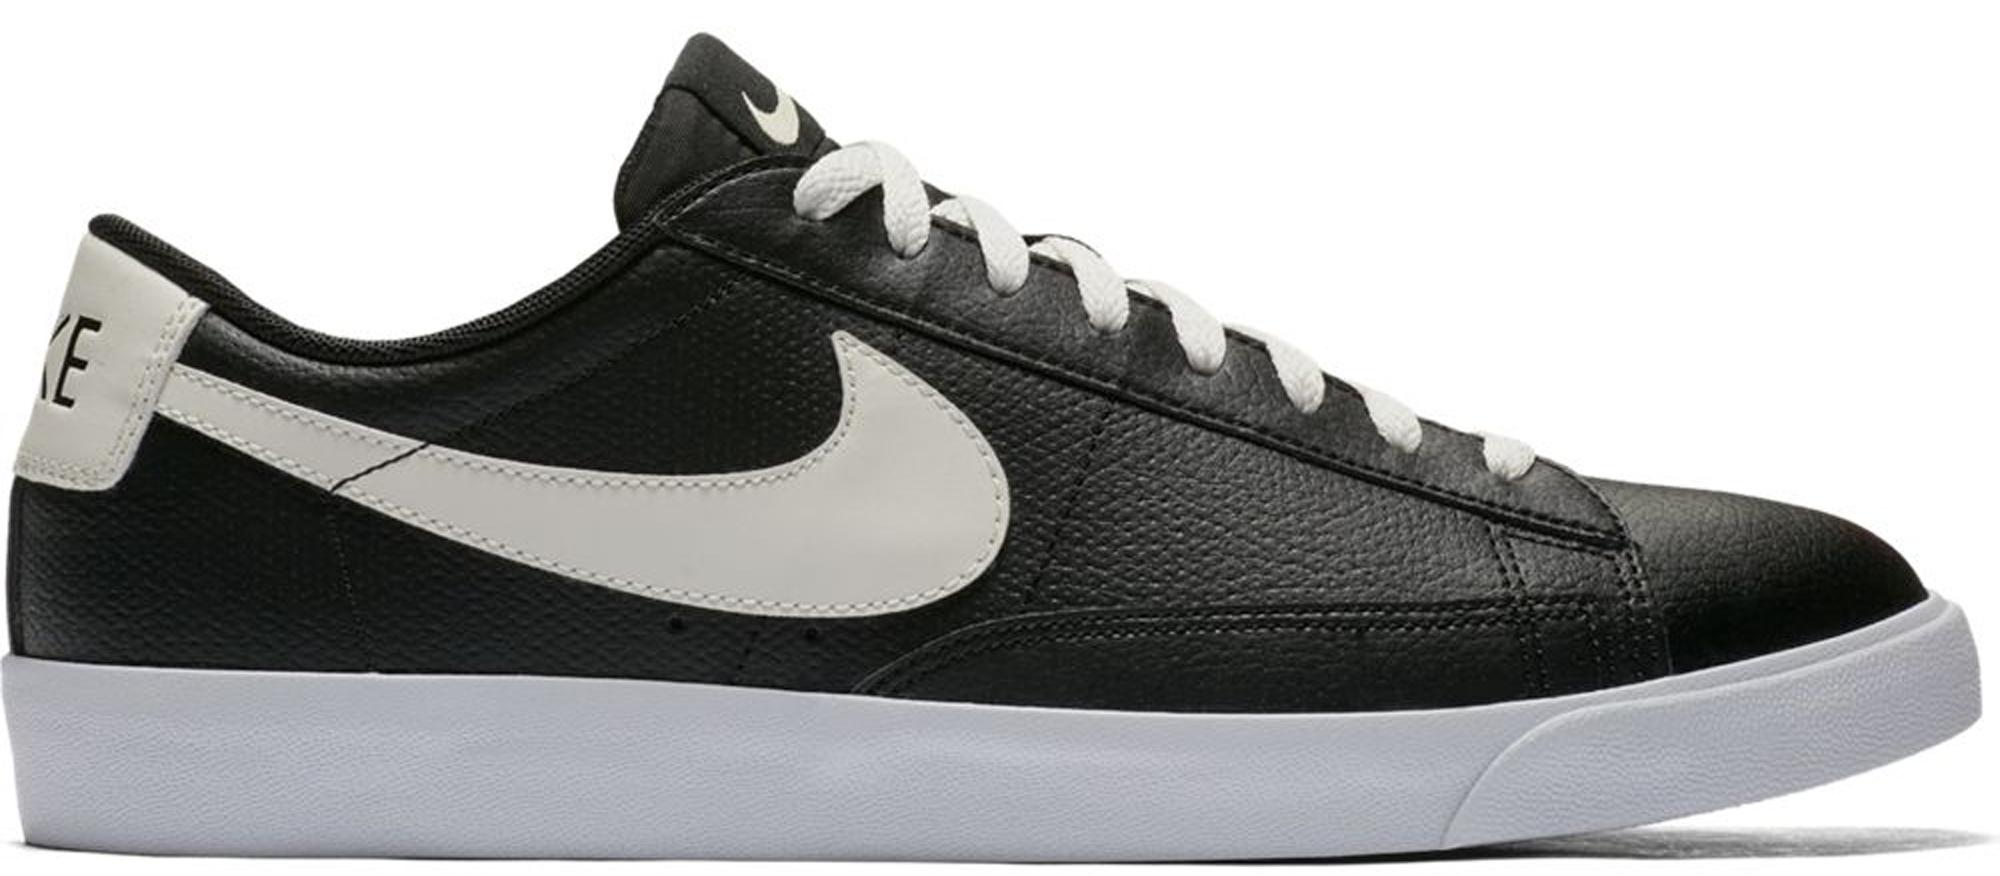 Nike Blazer Low Leather Black Sail